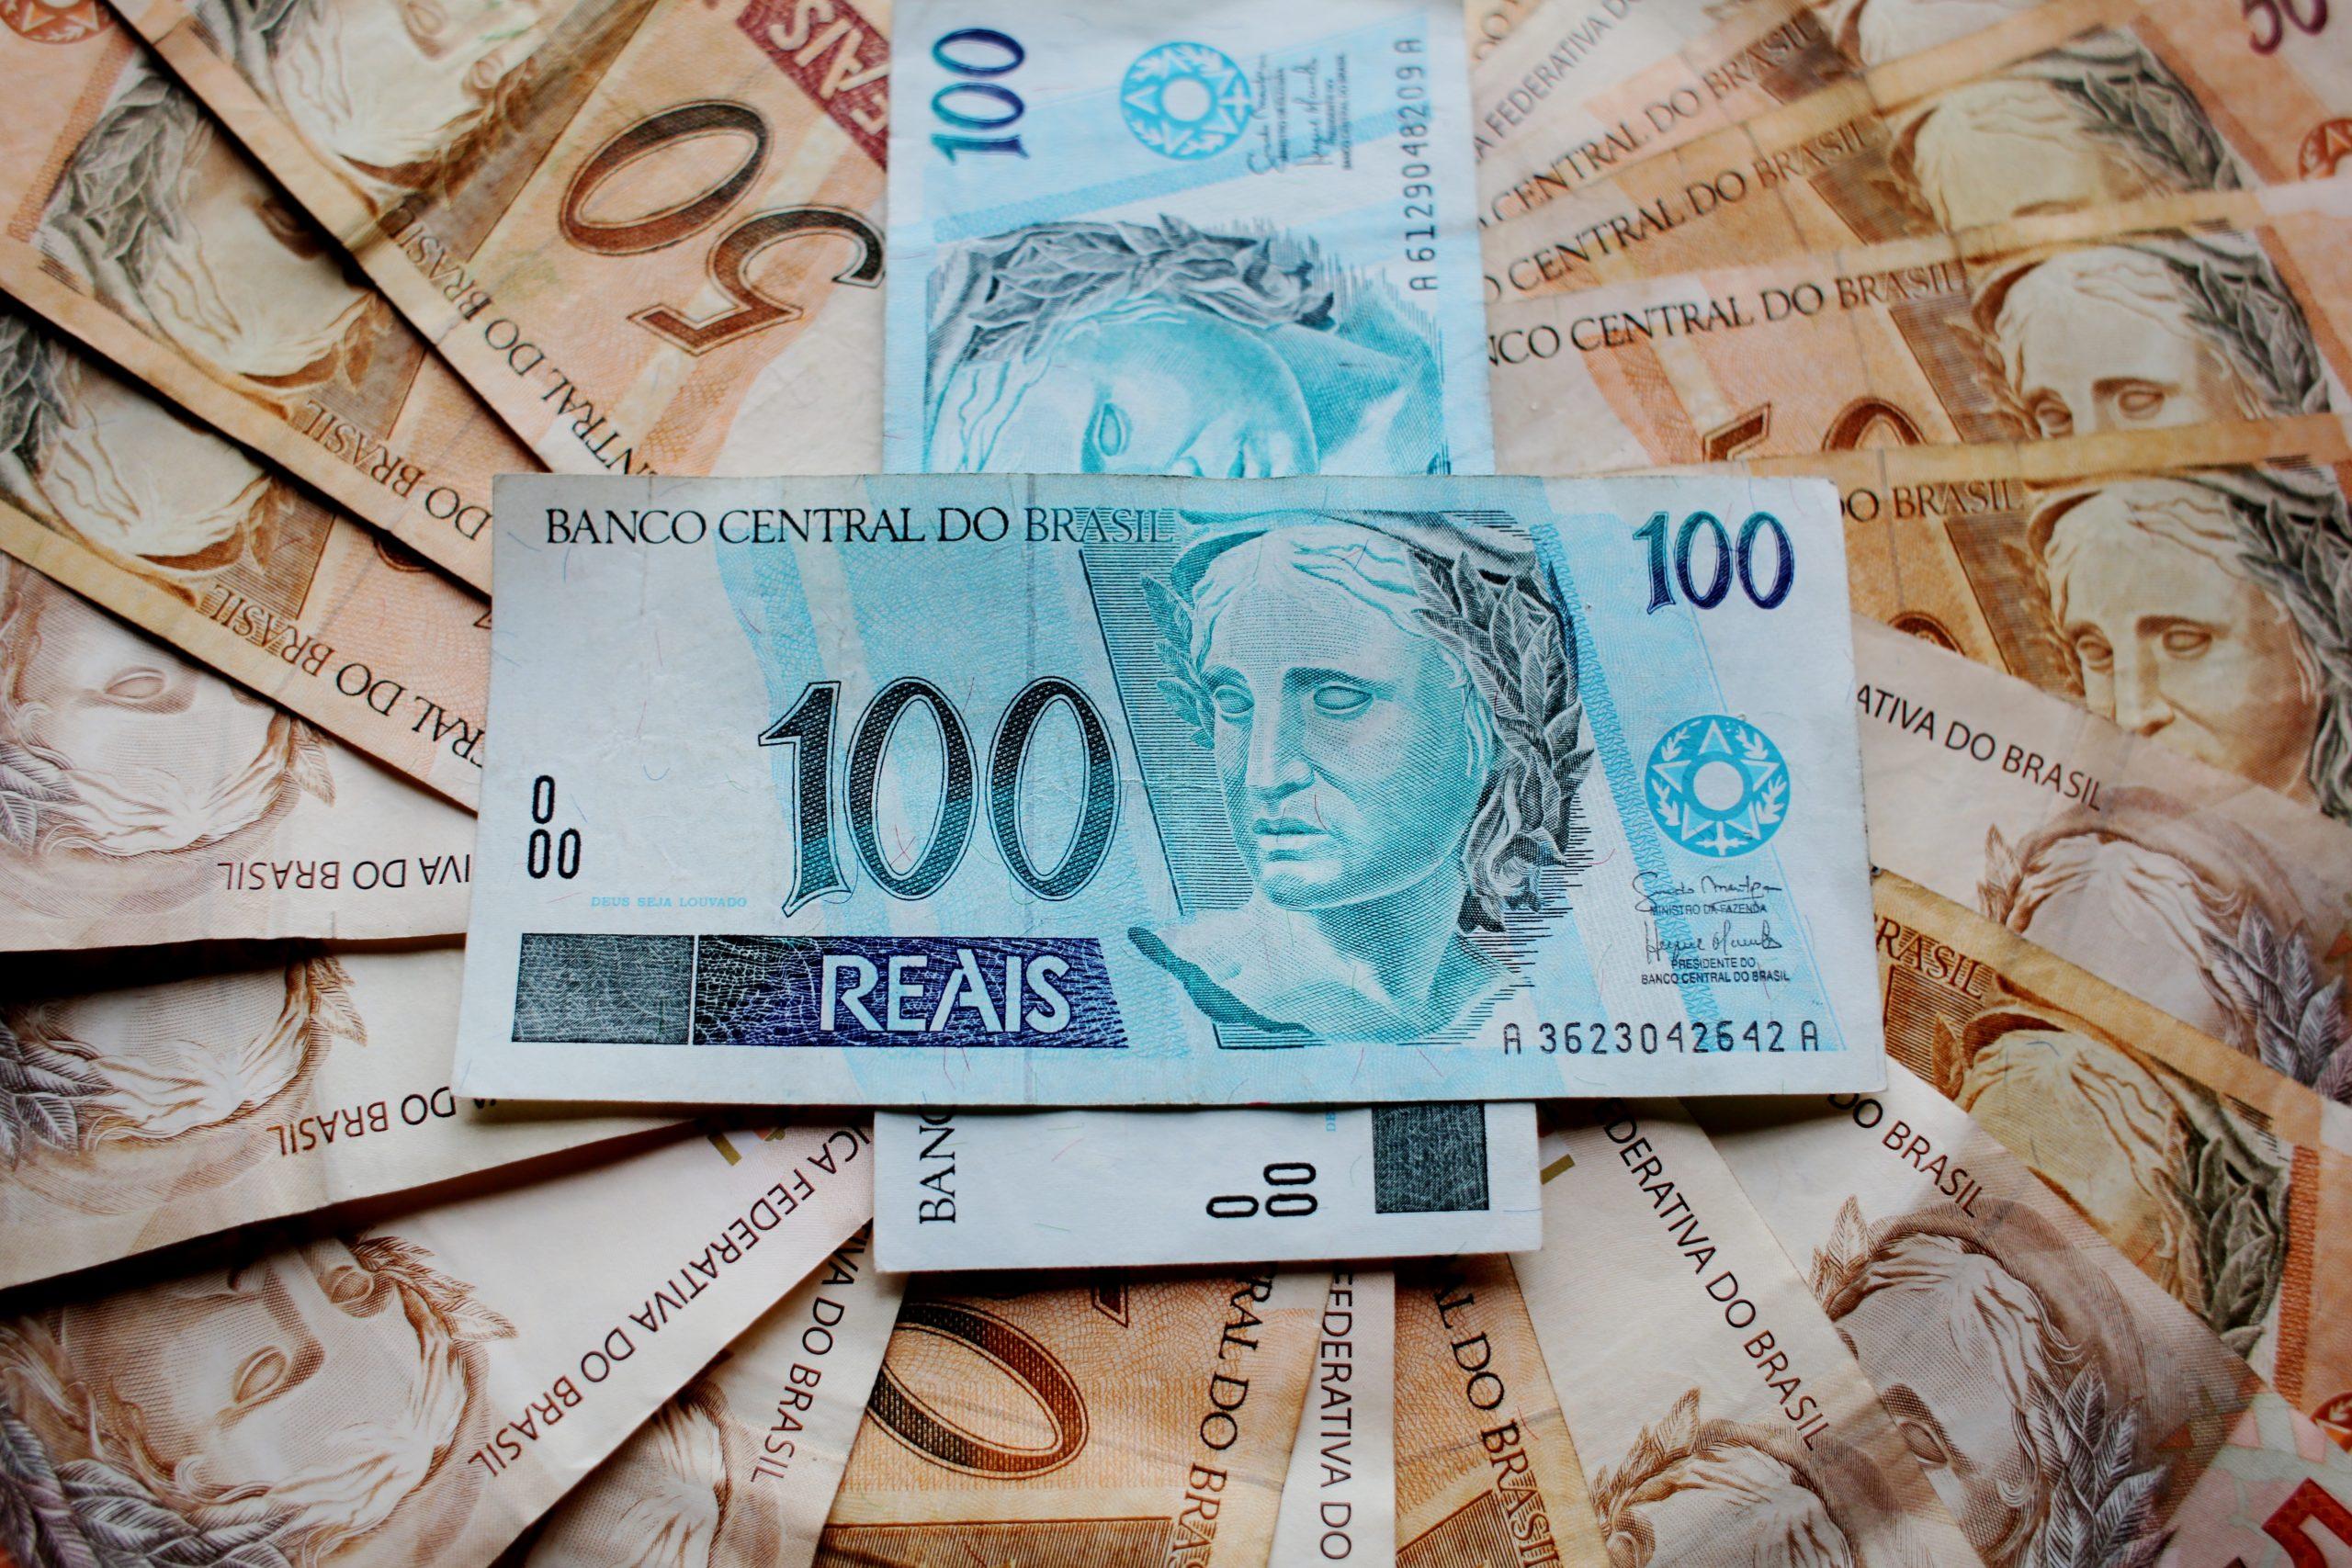 Notas de R$100 e de R$50.